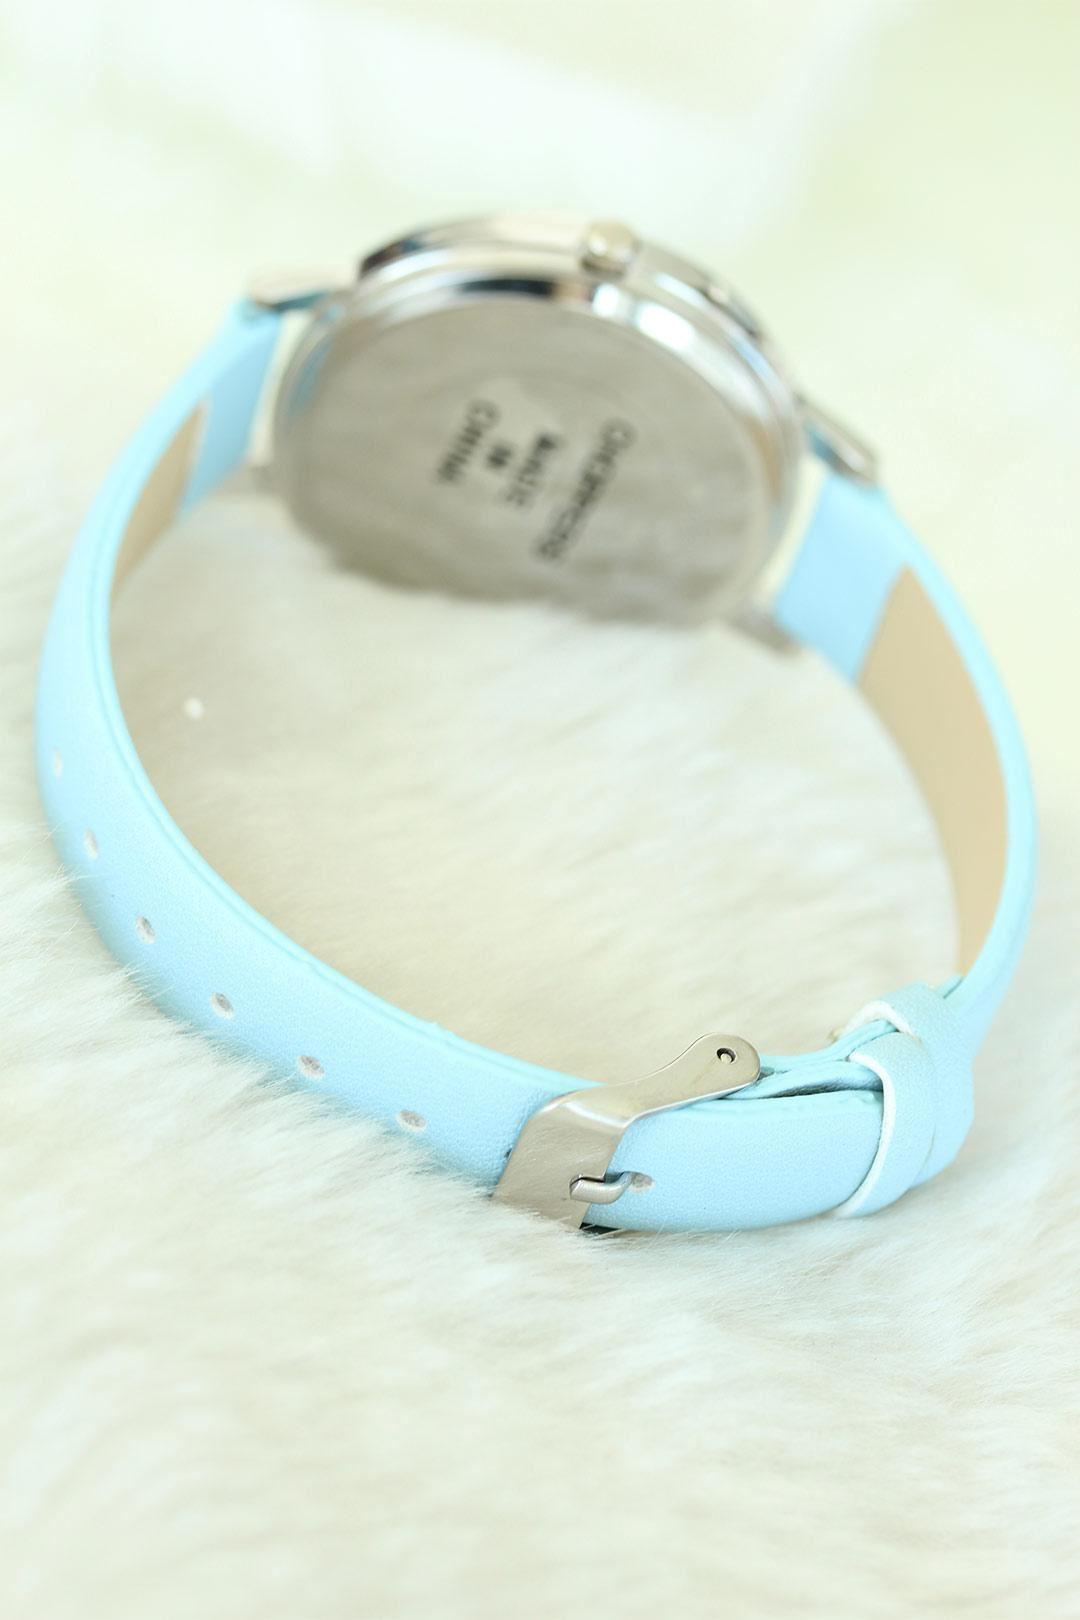 Mavi Renk Deri Kordonlu Silver Kasa Bayan Saat